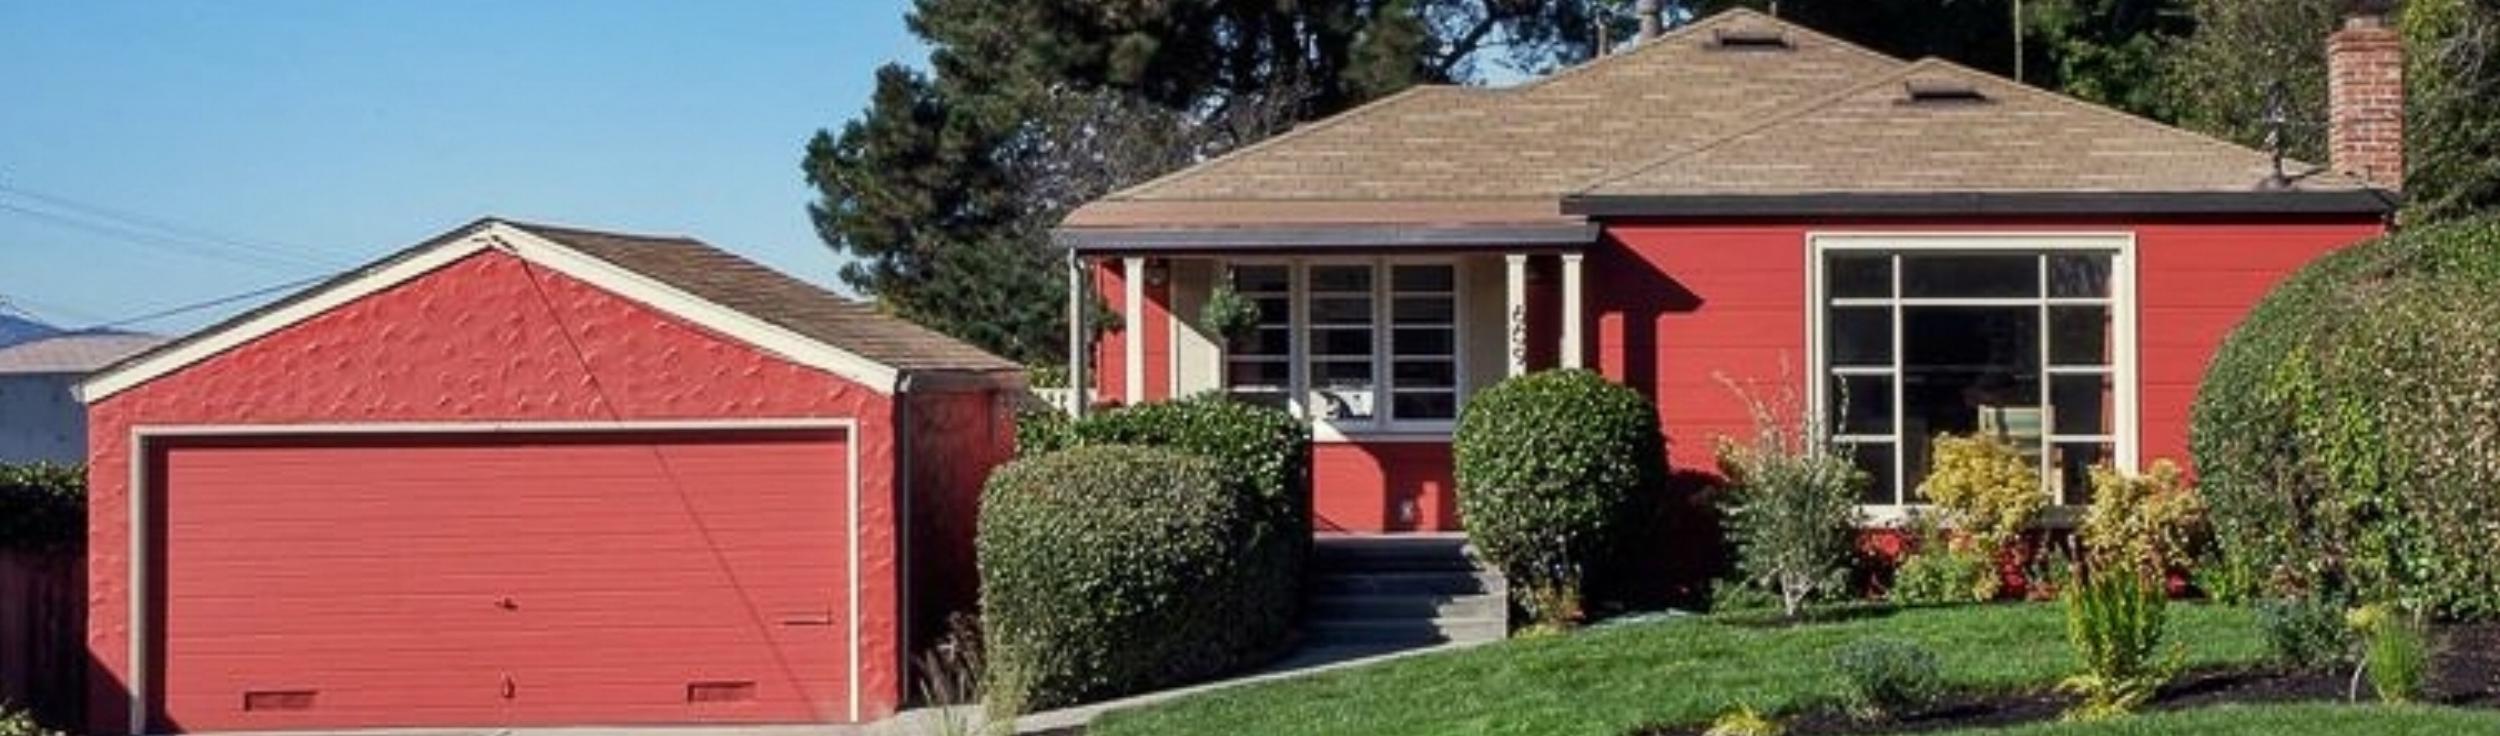 1940s subdivision sweetheart.jpg